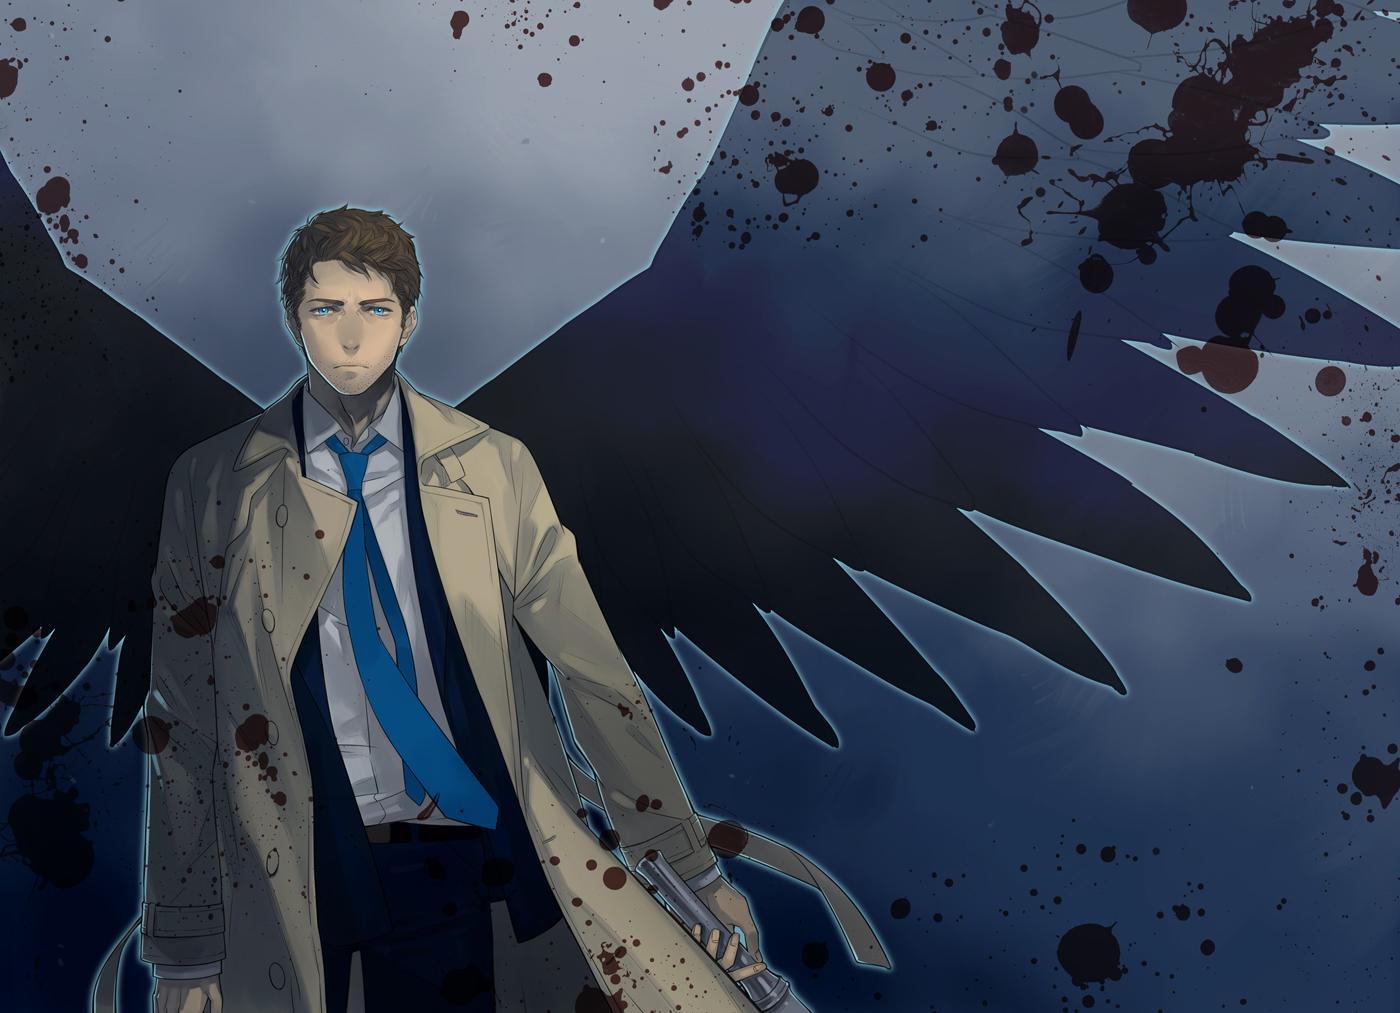 castiel supernatural image 1630685 zerochan anime